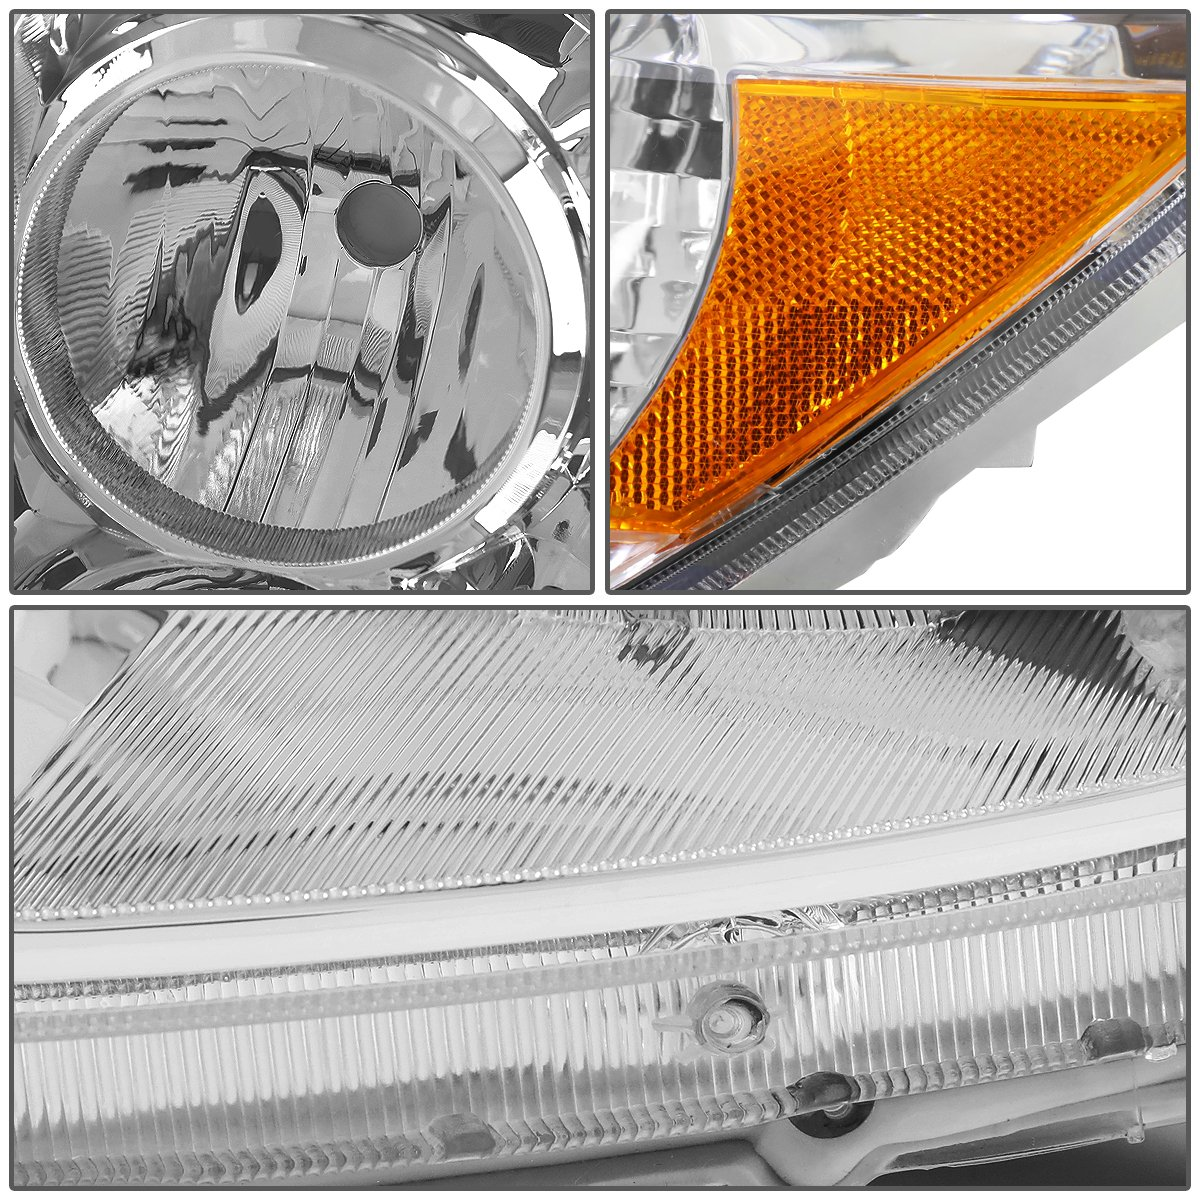 For Toyota 4runner N210 4th Gen Pair Of Chrome Housing 1992 Projector Lights Amber Corner Headlight Automotive